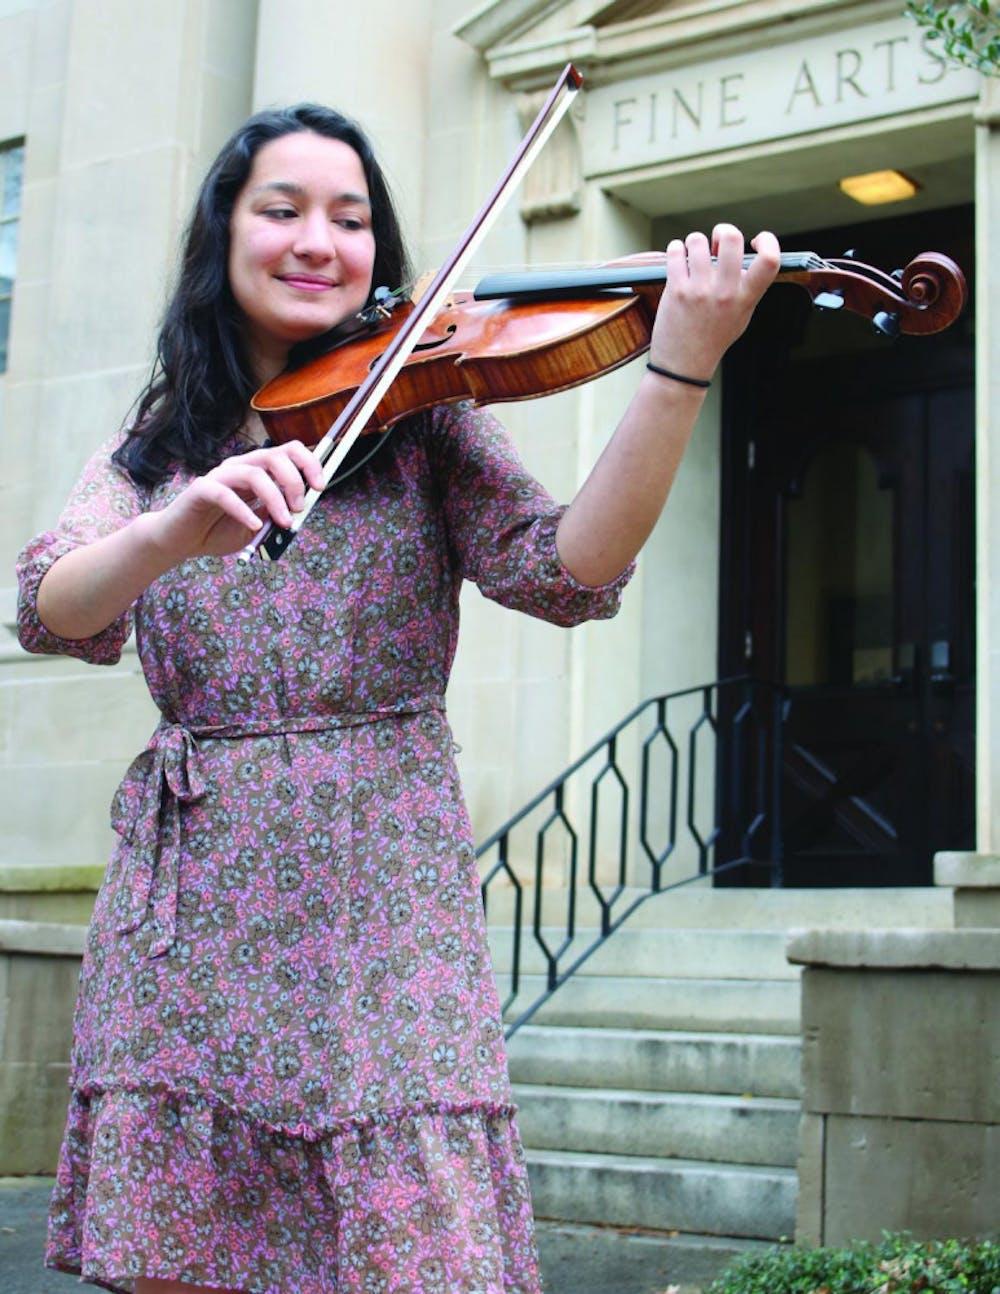 Julia Swain is a Music Performance major at Mercer.